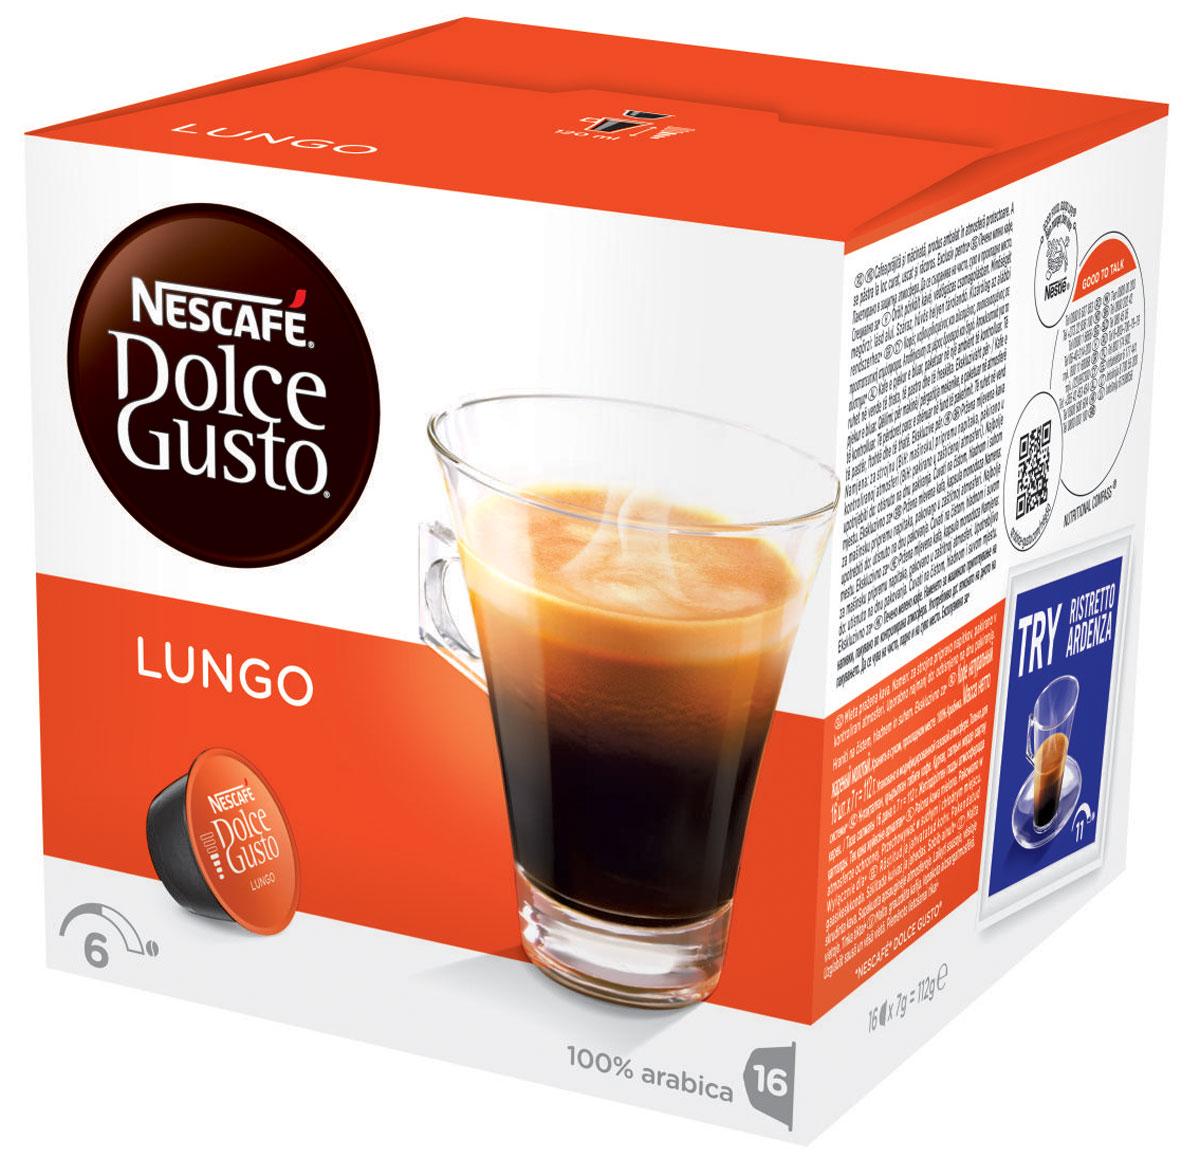 Nescafe Dolce Gusto Lungo кофе в капсулах, 16 шт di maestri dolce gusto caffe latte кофе в капсулах 16 шт